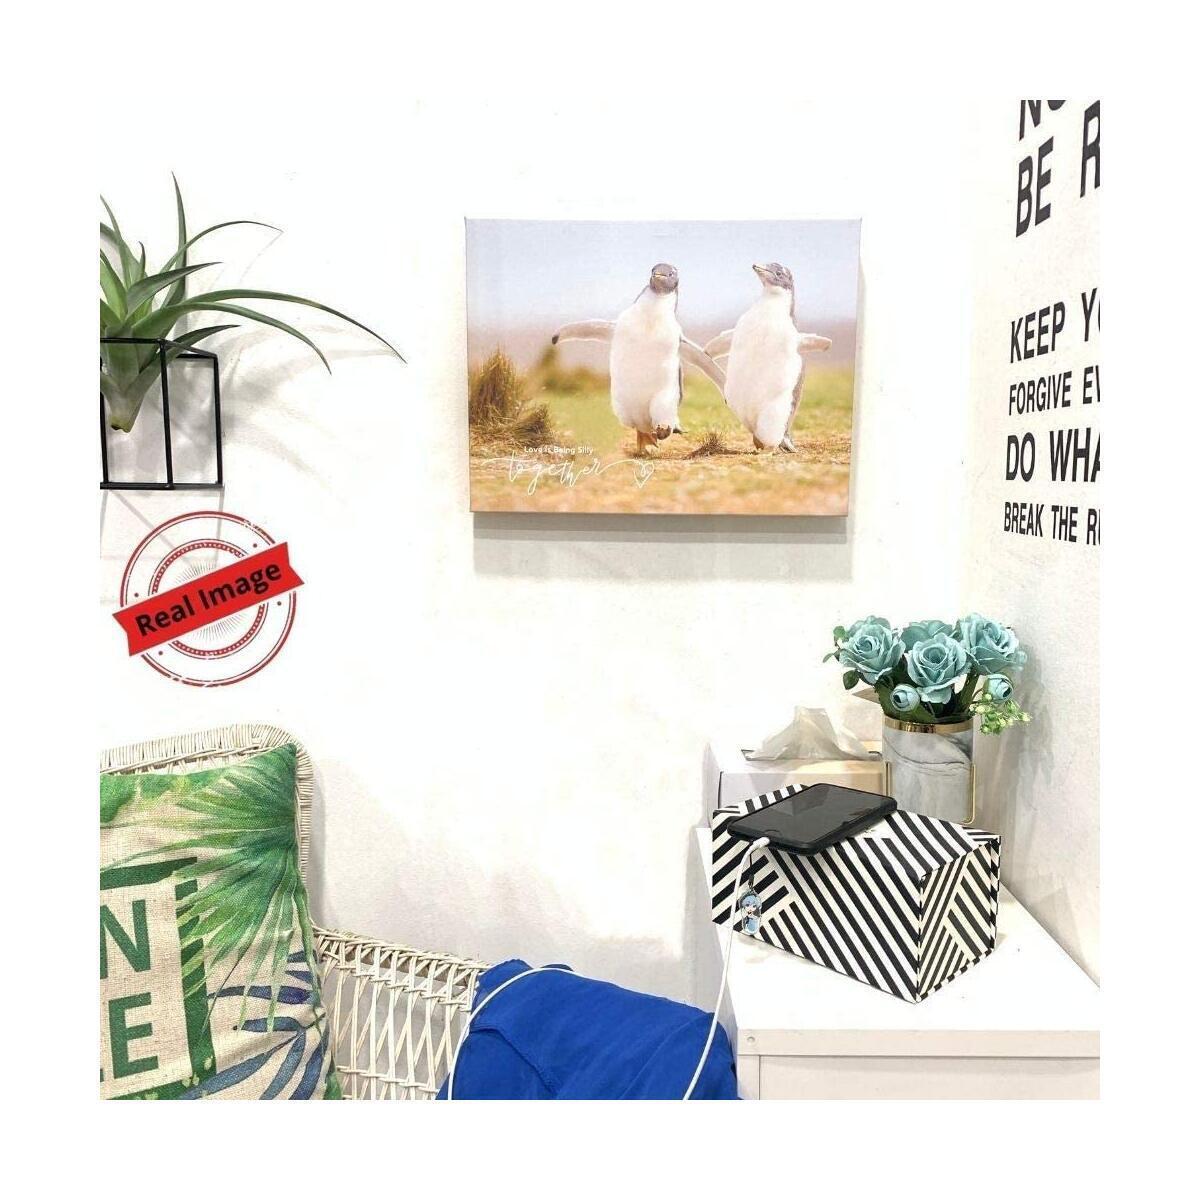 Canvas Wall Art - Funny Bathroom Decor, Cute Room Decor For Teen Girls Boys, Animal Print Picture, Framed Love Wall Decor, Funny Bathroom Wall Art, Ready to Hang, Cuadros Para Dormitorios, Baños